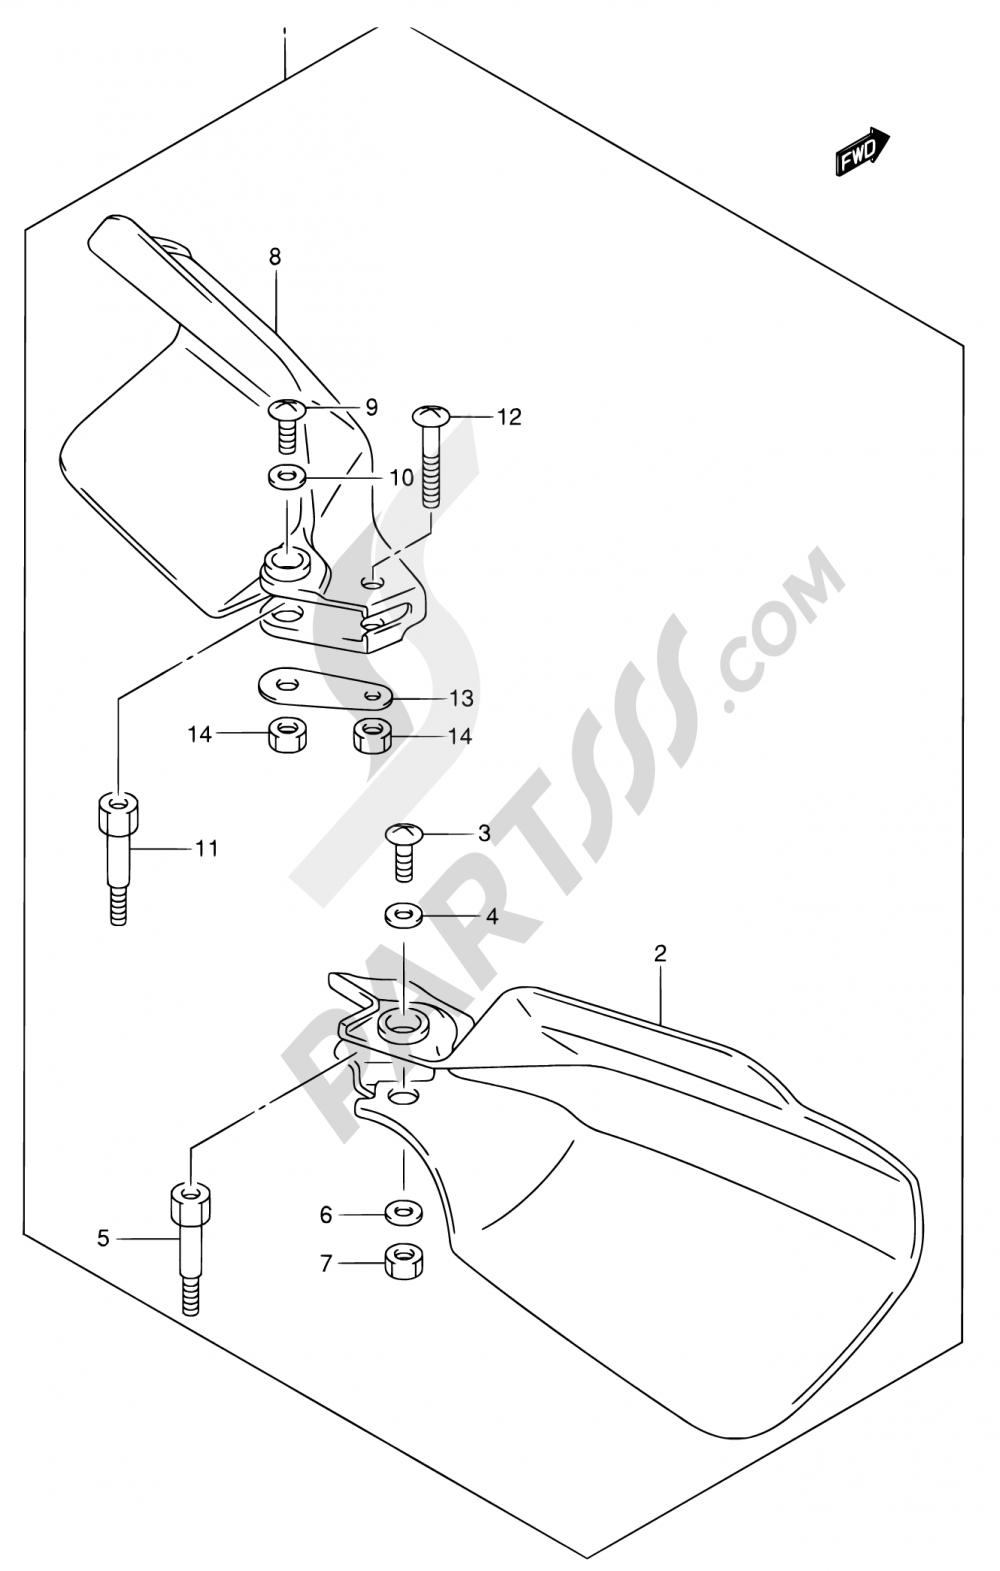 45C - KNUCKLE COVER (DR-Z400EK1/EK2/EK3/EK4 E24 OPT) Suzuki DR-Z400 2013